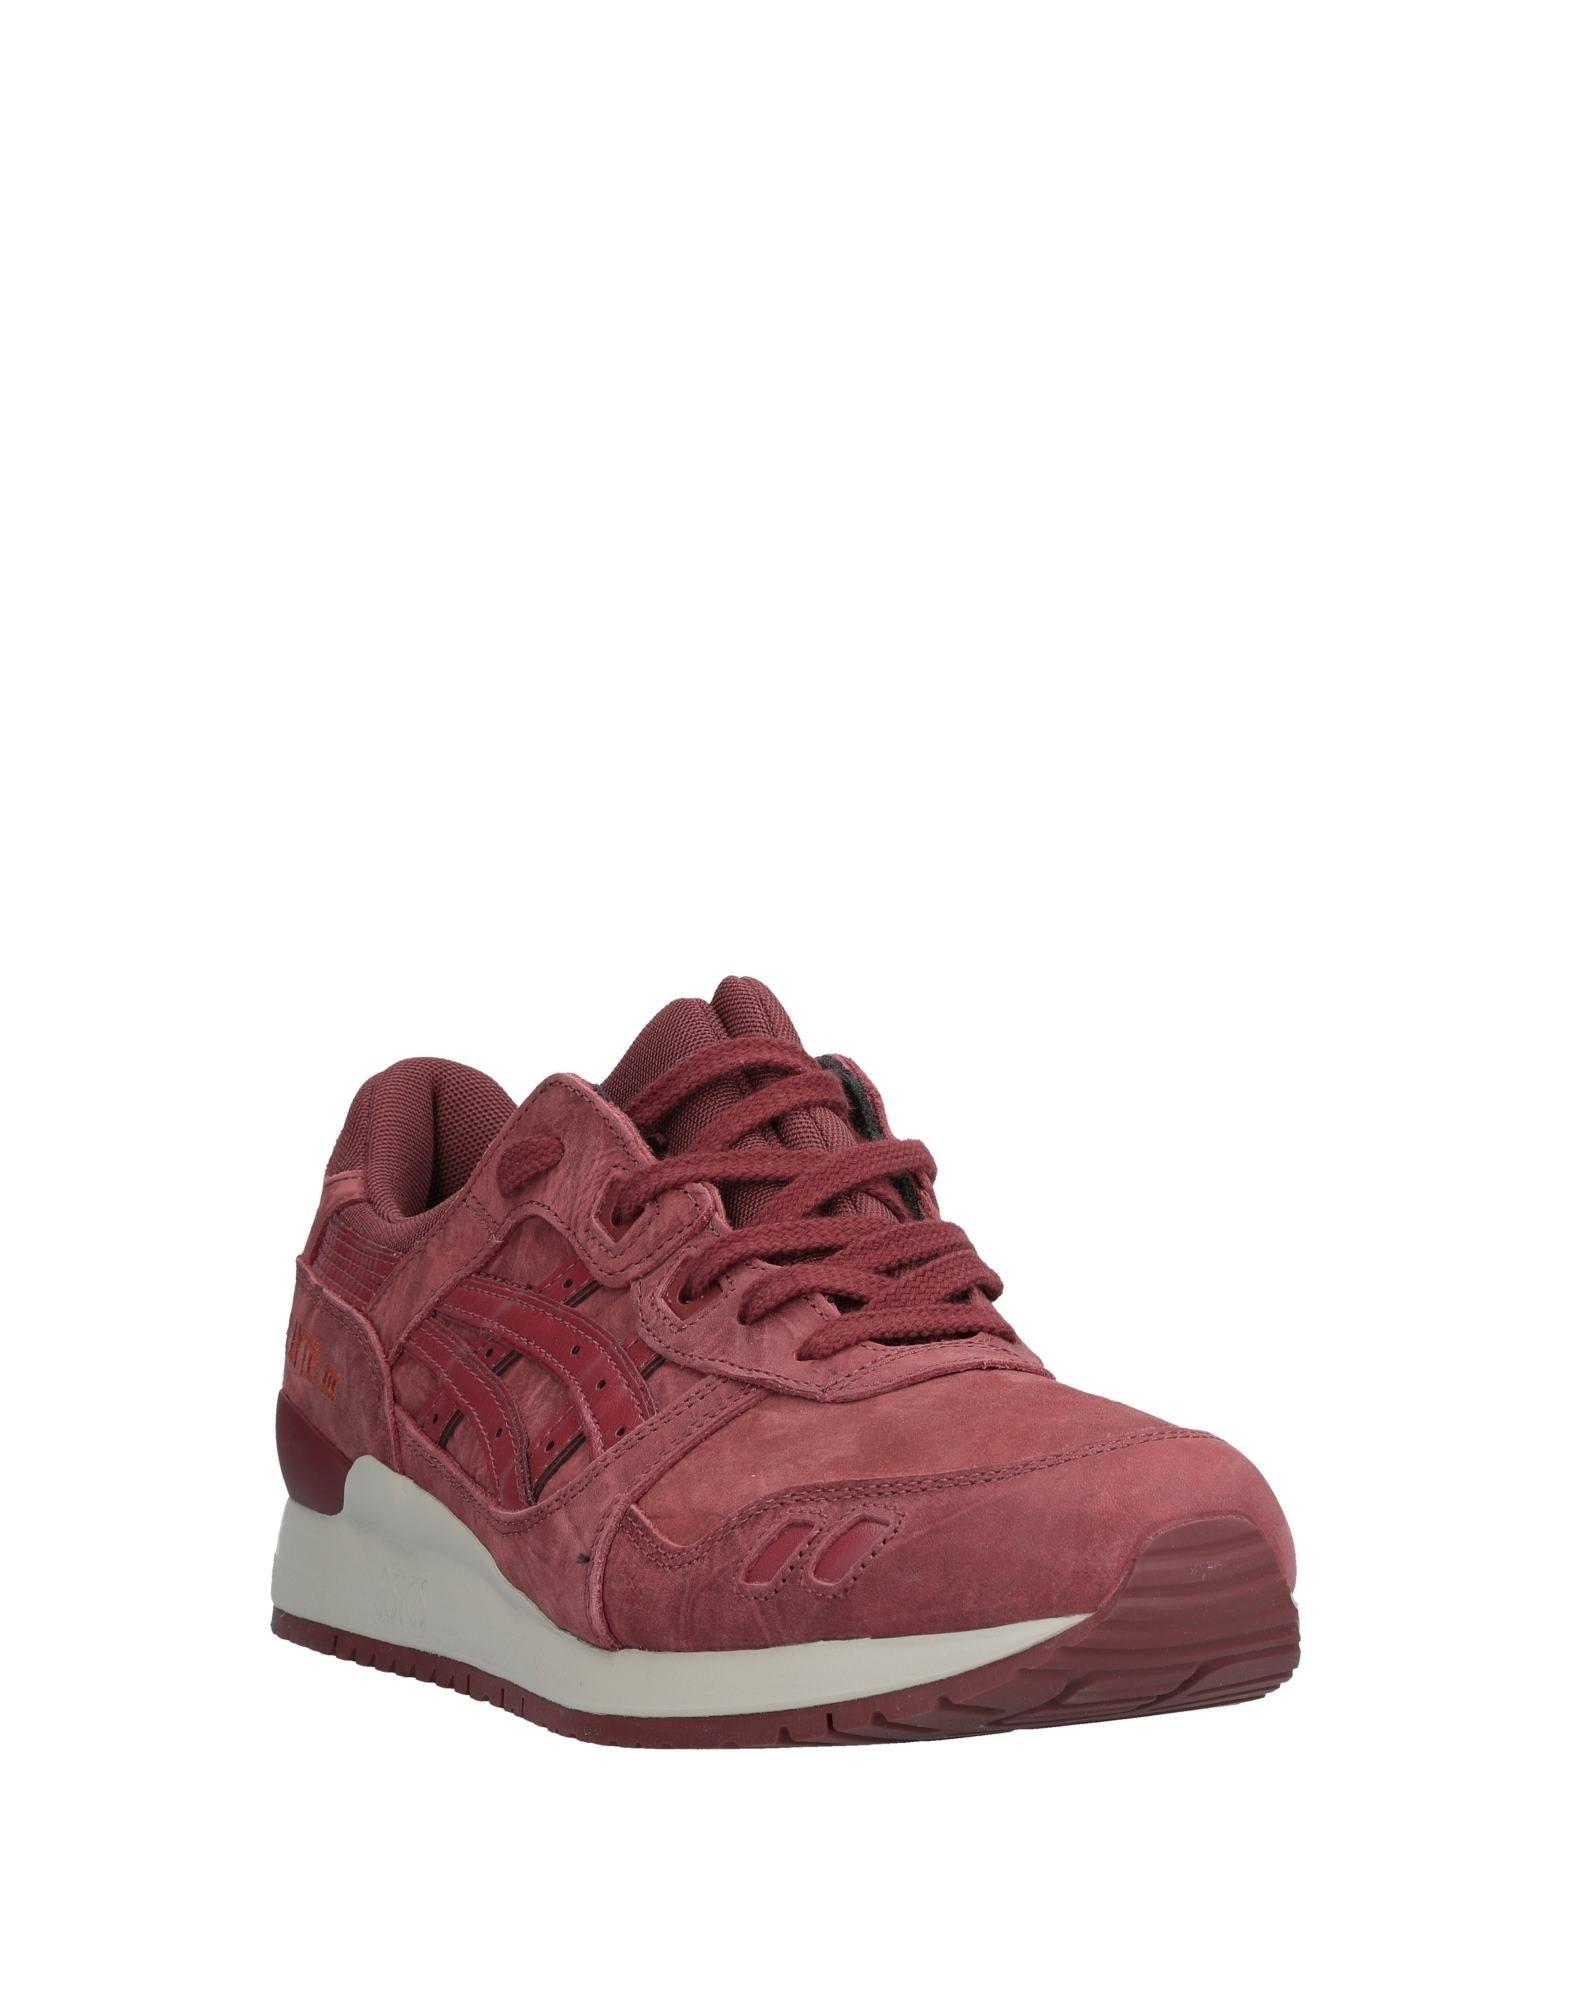 Asics Tiger Tiger Asics Sneakers Herren  11535848GX Neue Schuhe 5848e3